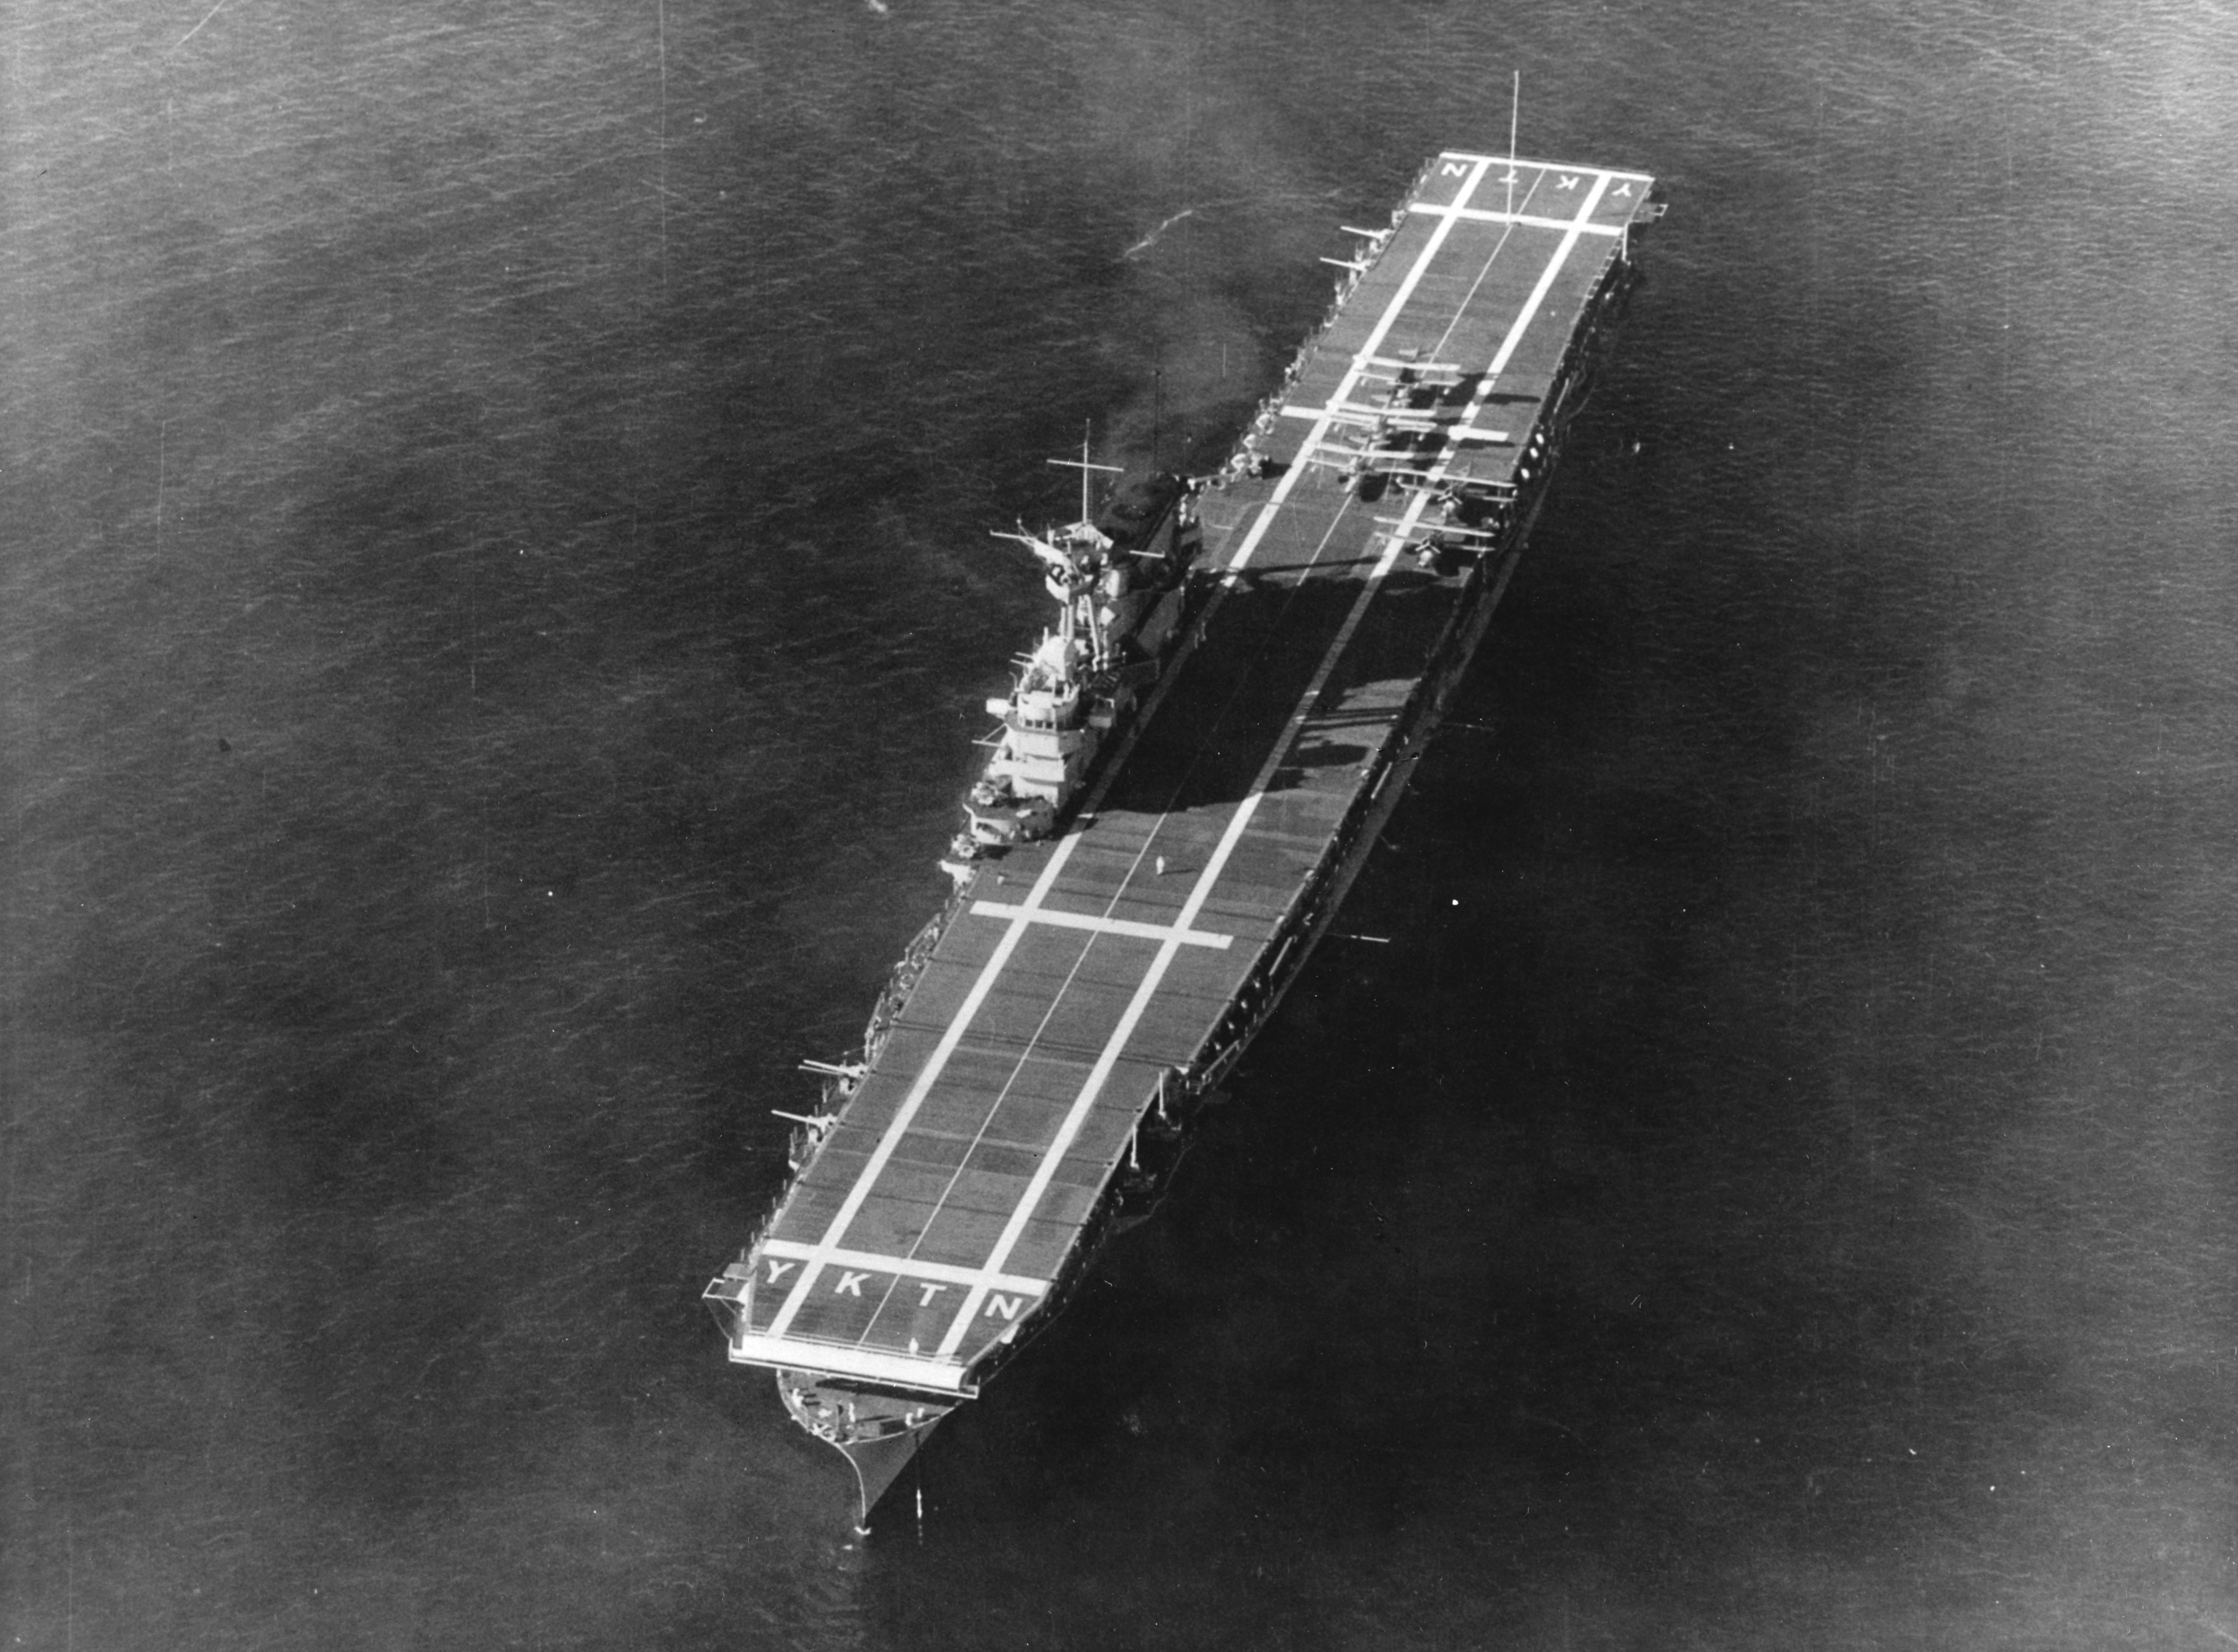 cv bestand Bestand:Overhead view of USS Yorktown (CV 5) in the Caribbean Sea